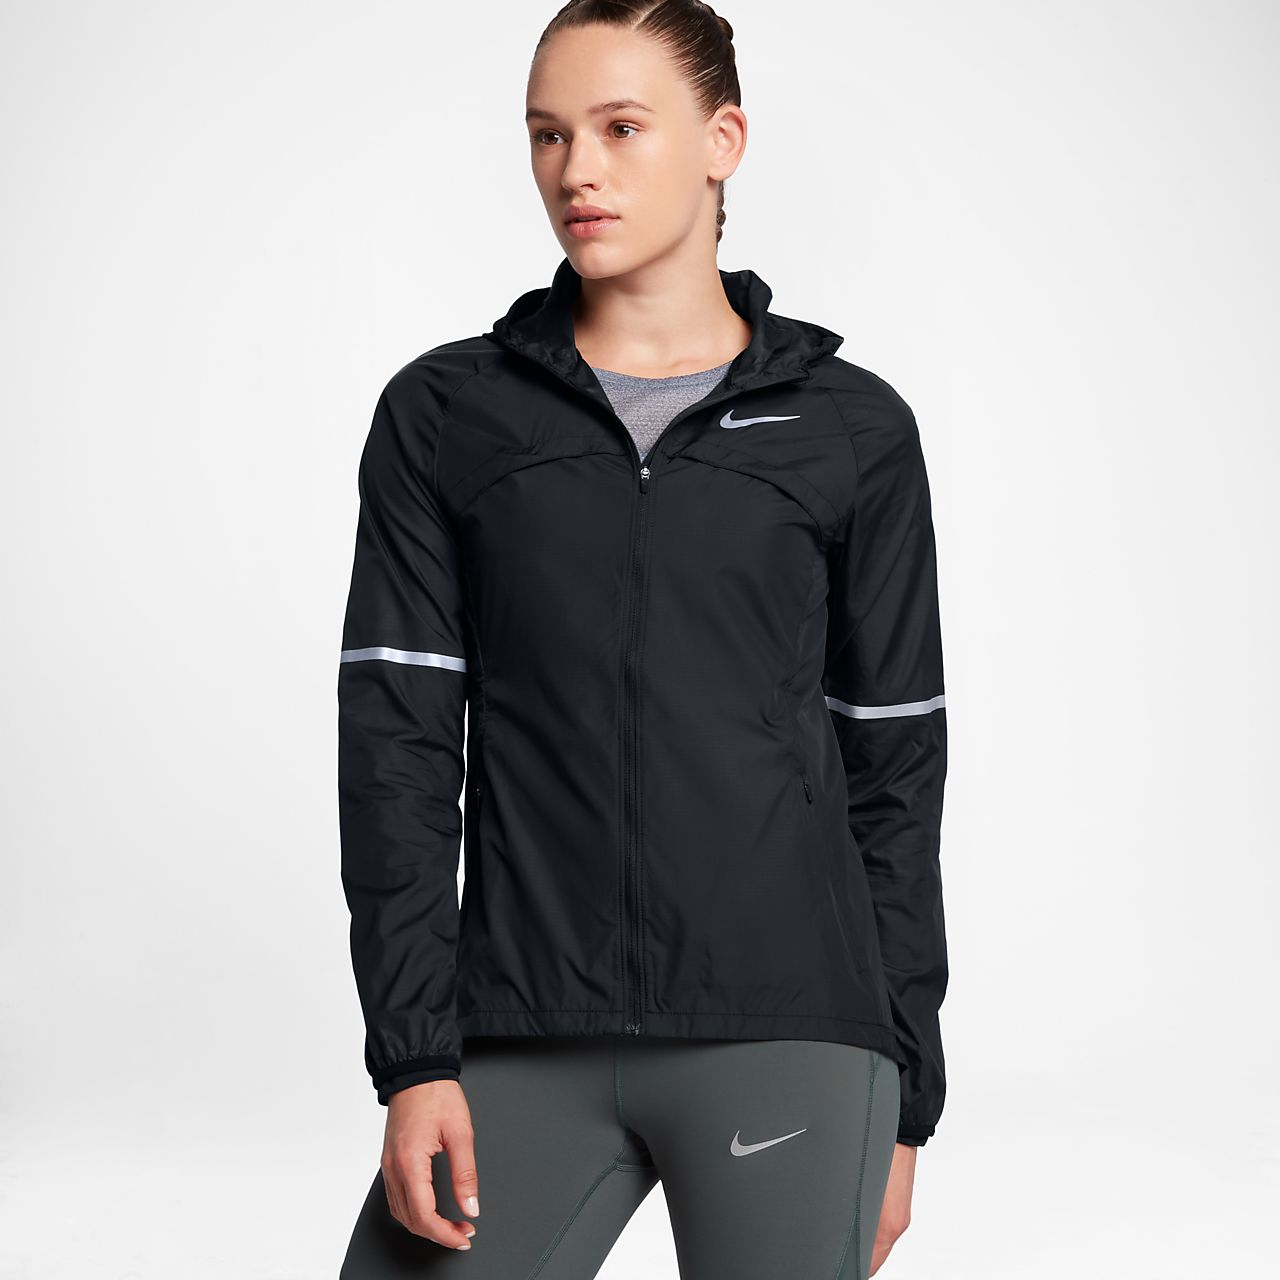 Low Resolution Nike Shield Women's Running Jacket Nike Shield Women's  Running Jacket